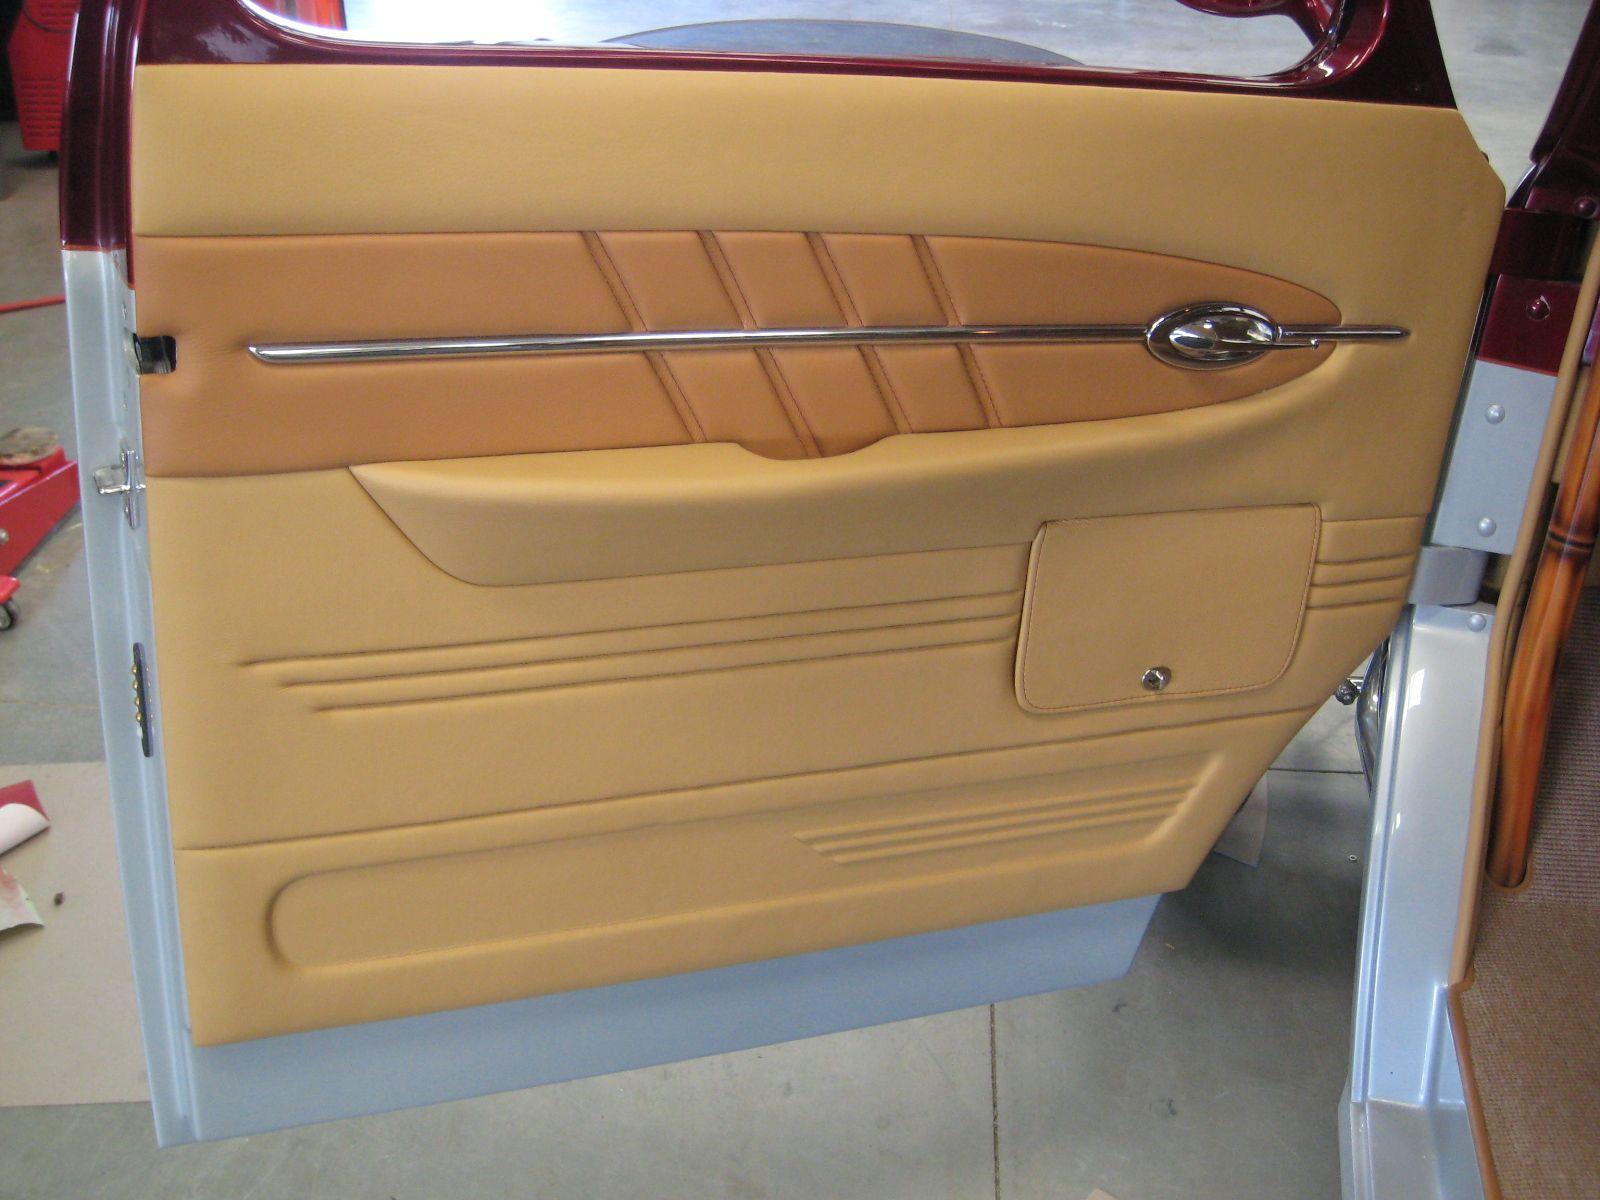 Hot Rod Interiors Upholstery Rod Door Door Panels Doors Sexiness Street Rods Forward Street Rod Custom Car Interior Camaro Interior Automotive Upholstery